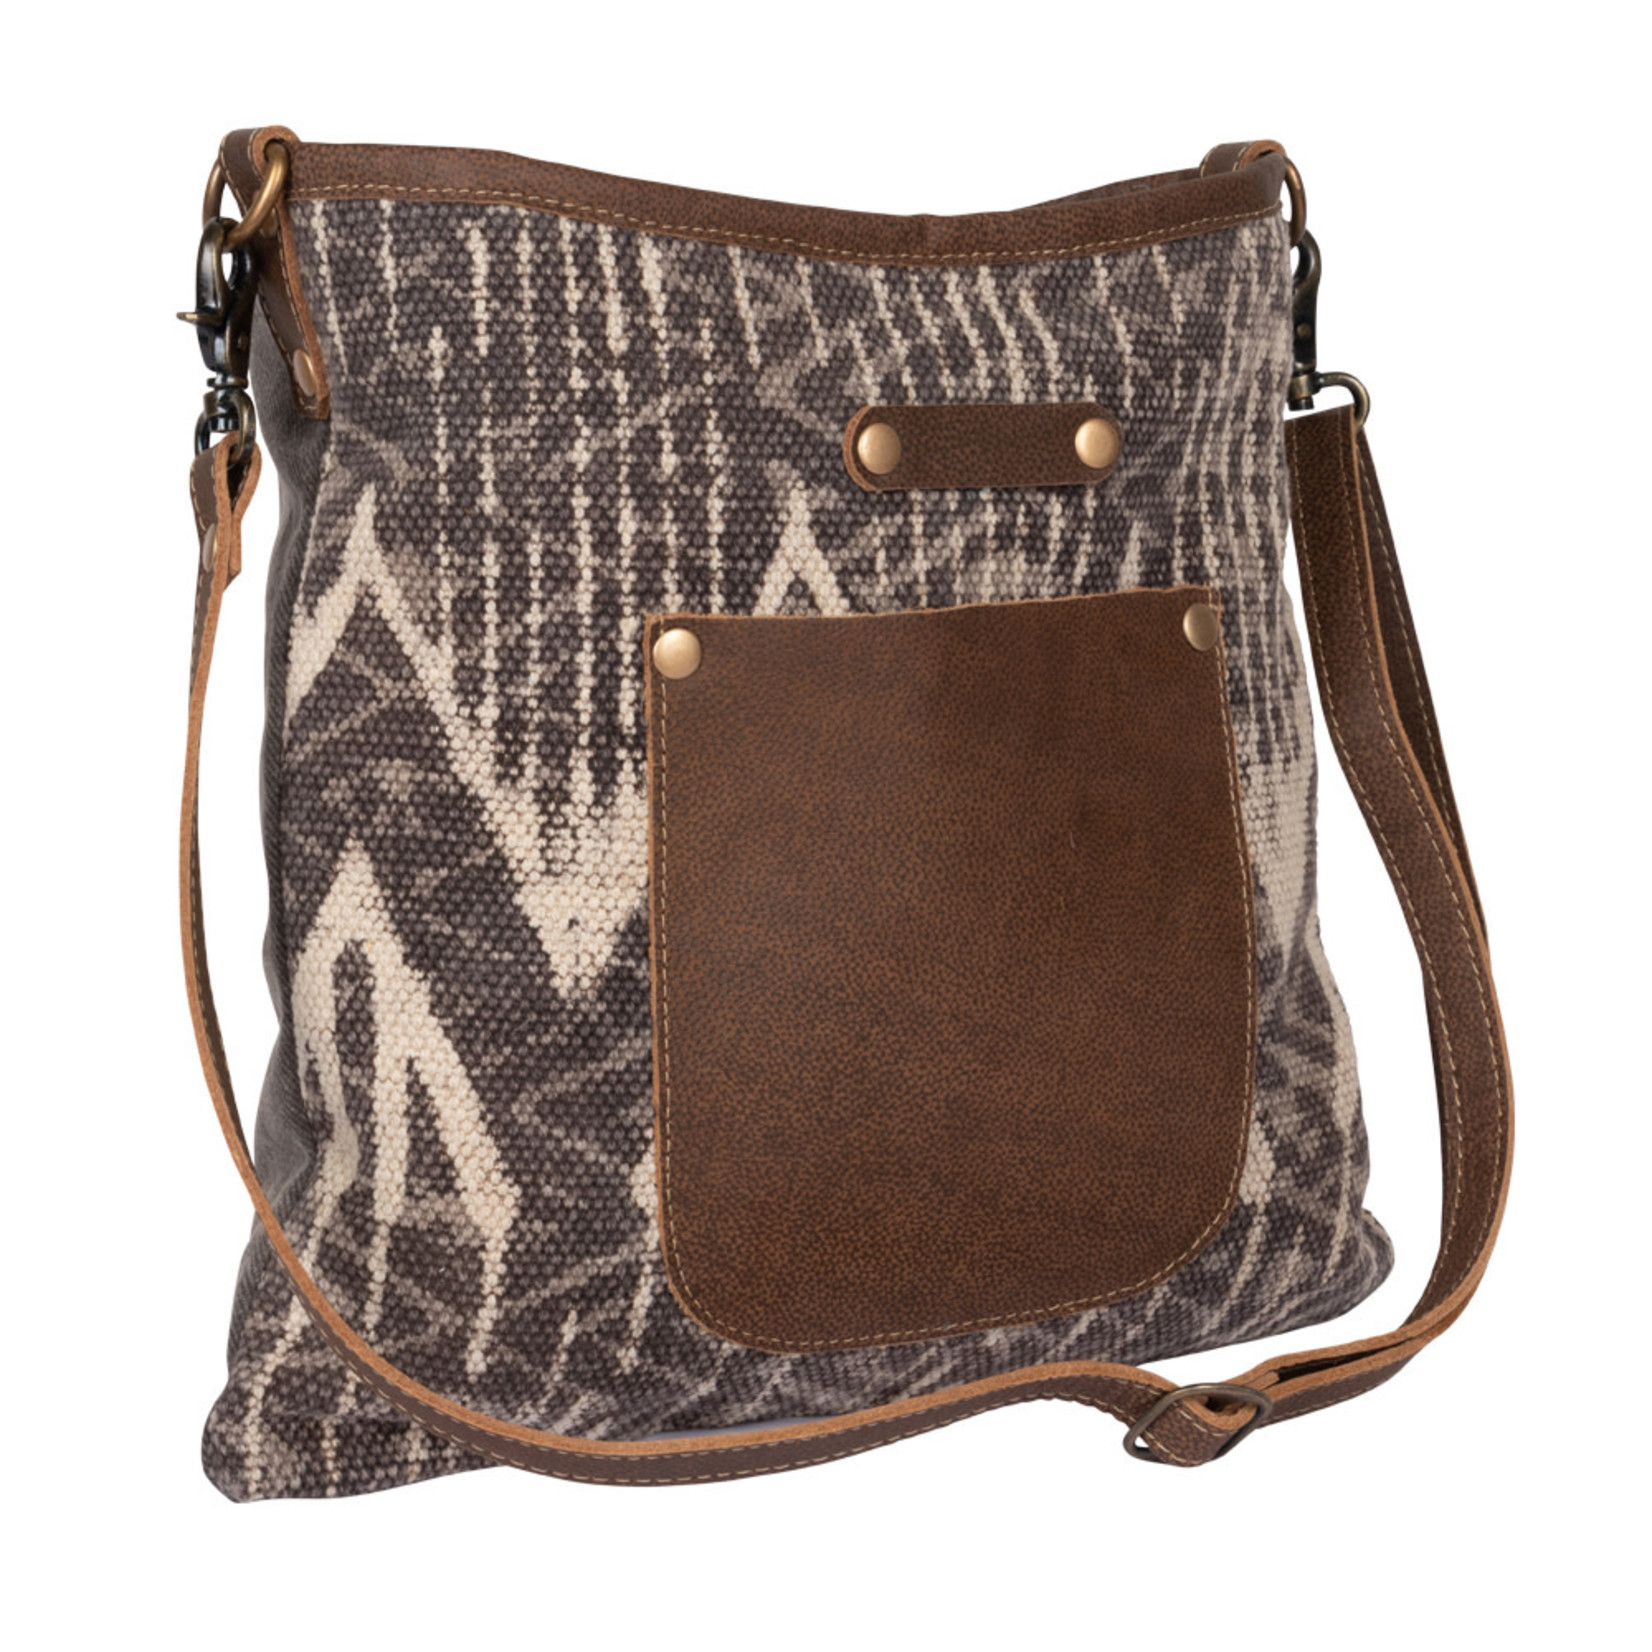 Myra Bags S-2239 Sepia Splash Shoulder Bag